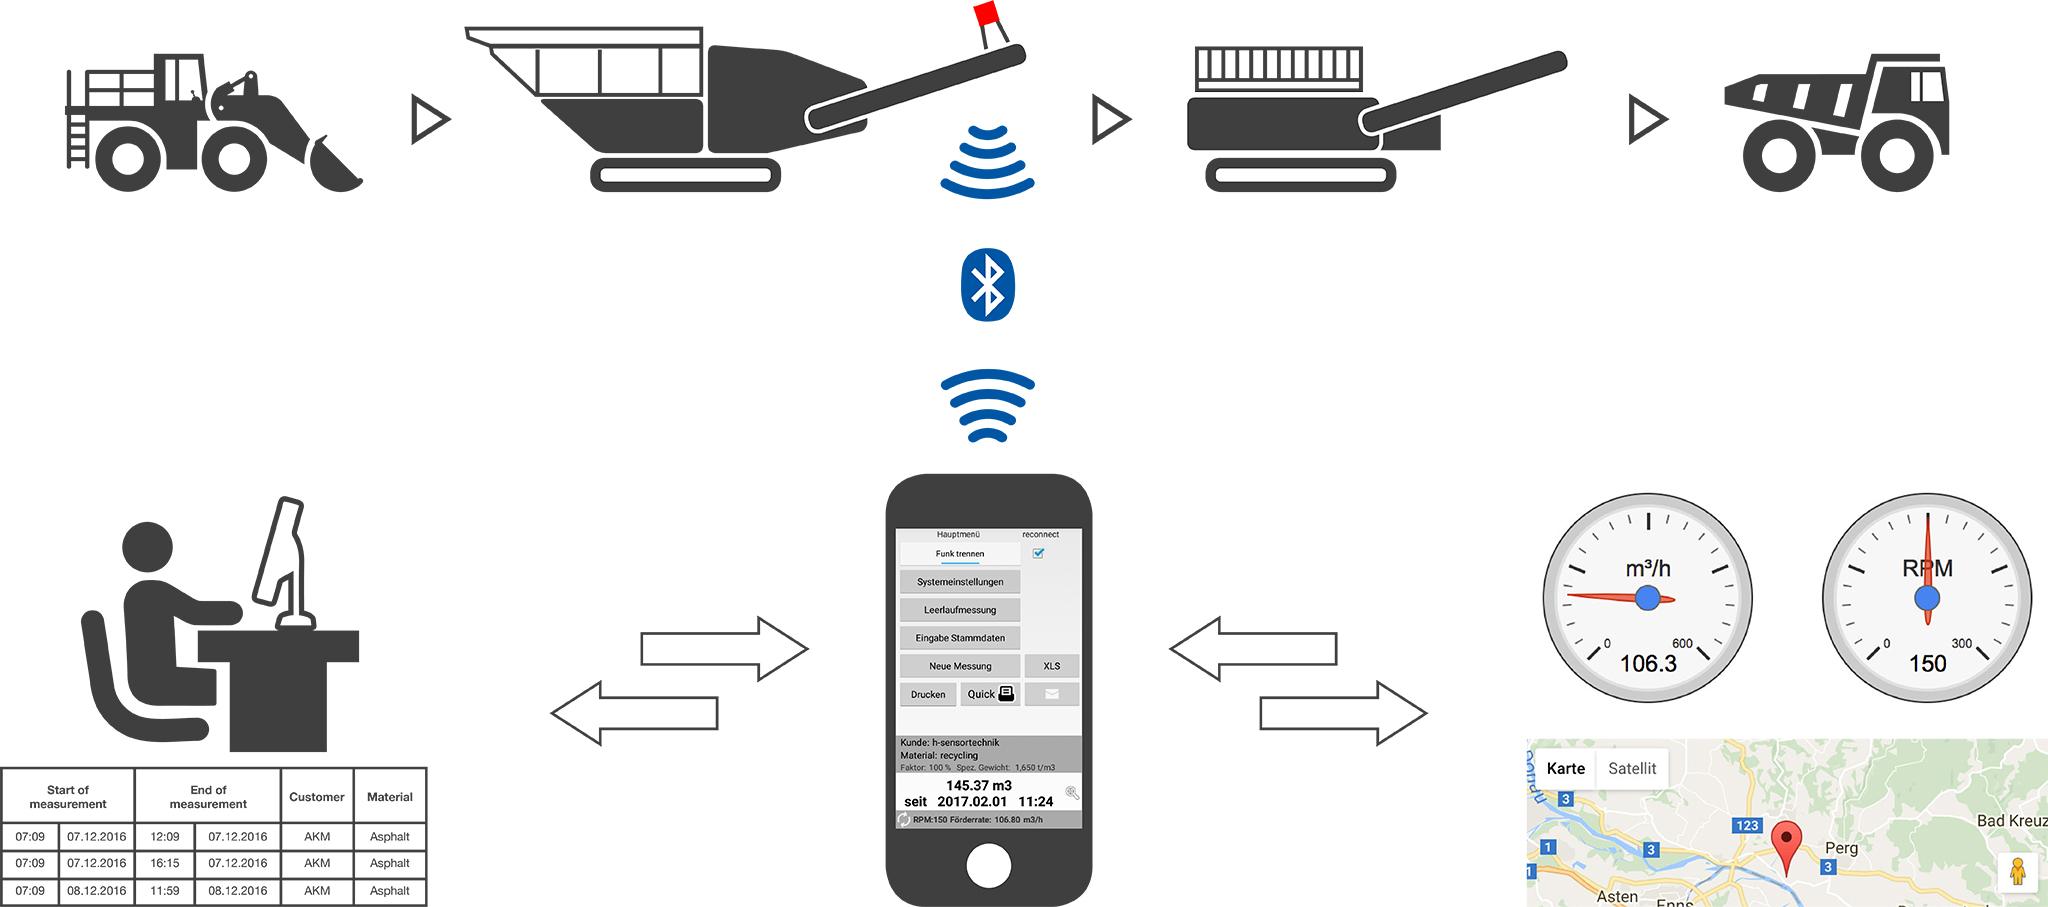 H-Sensortechnik